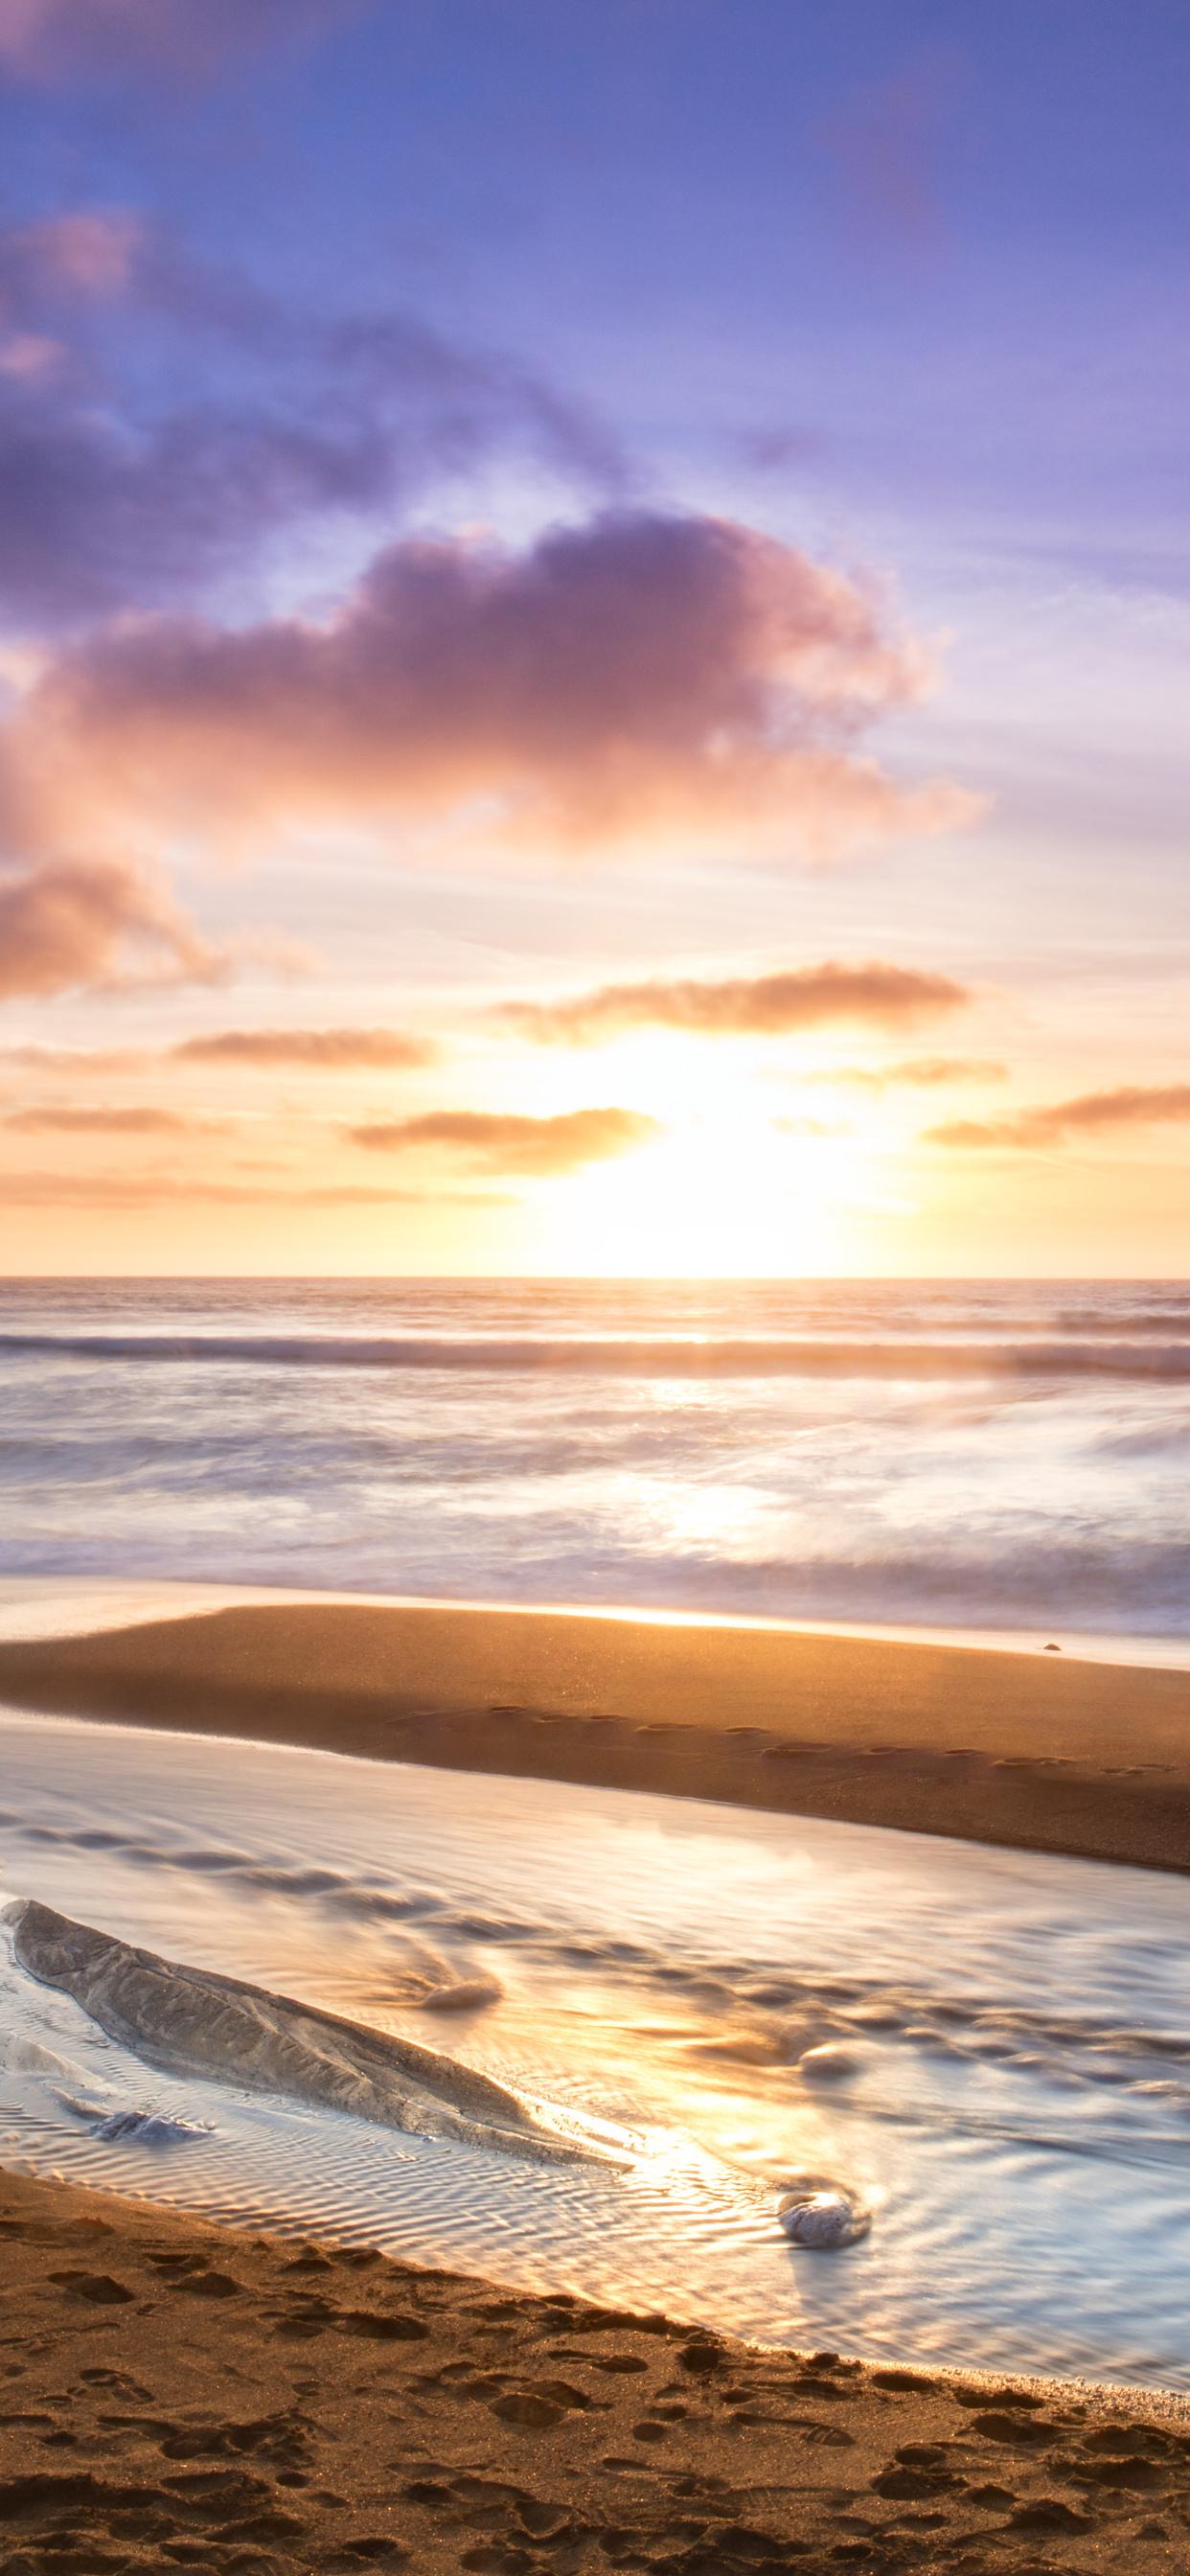 morning-beach-8k-bp.jpg